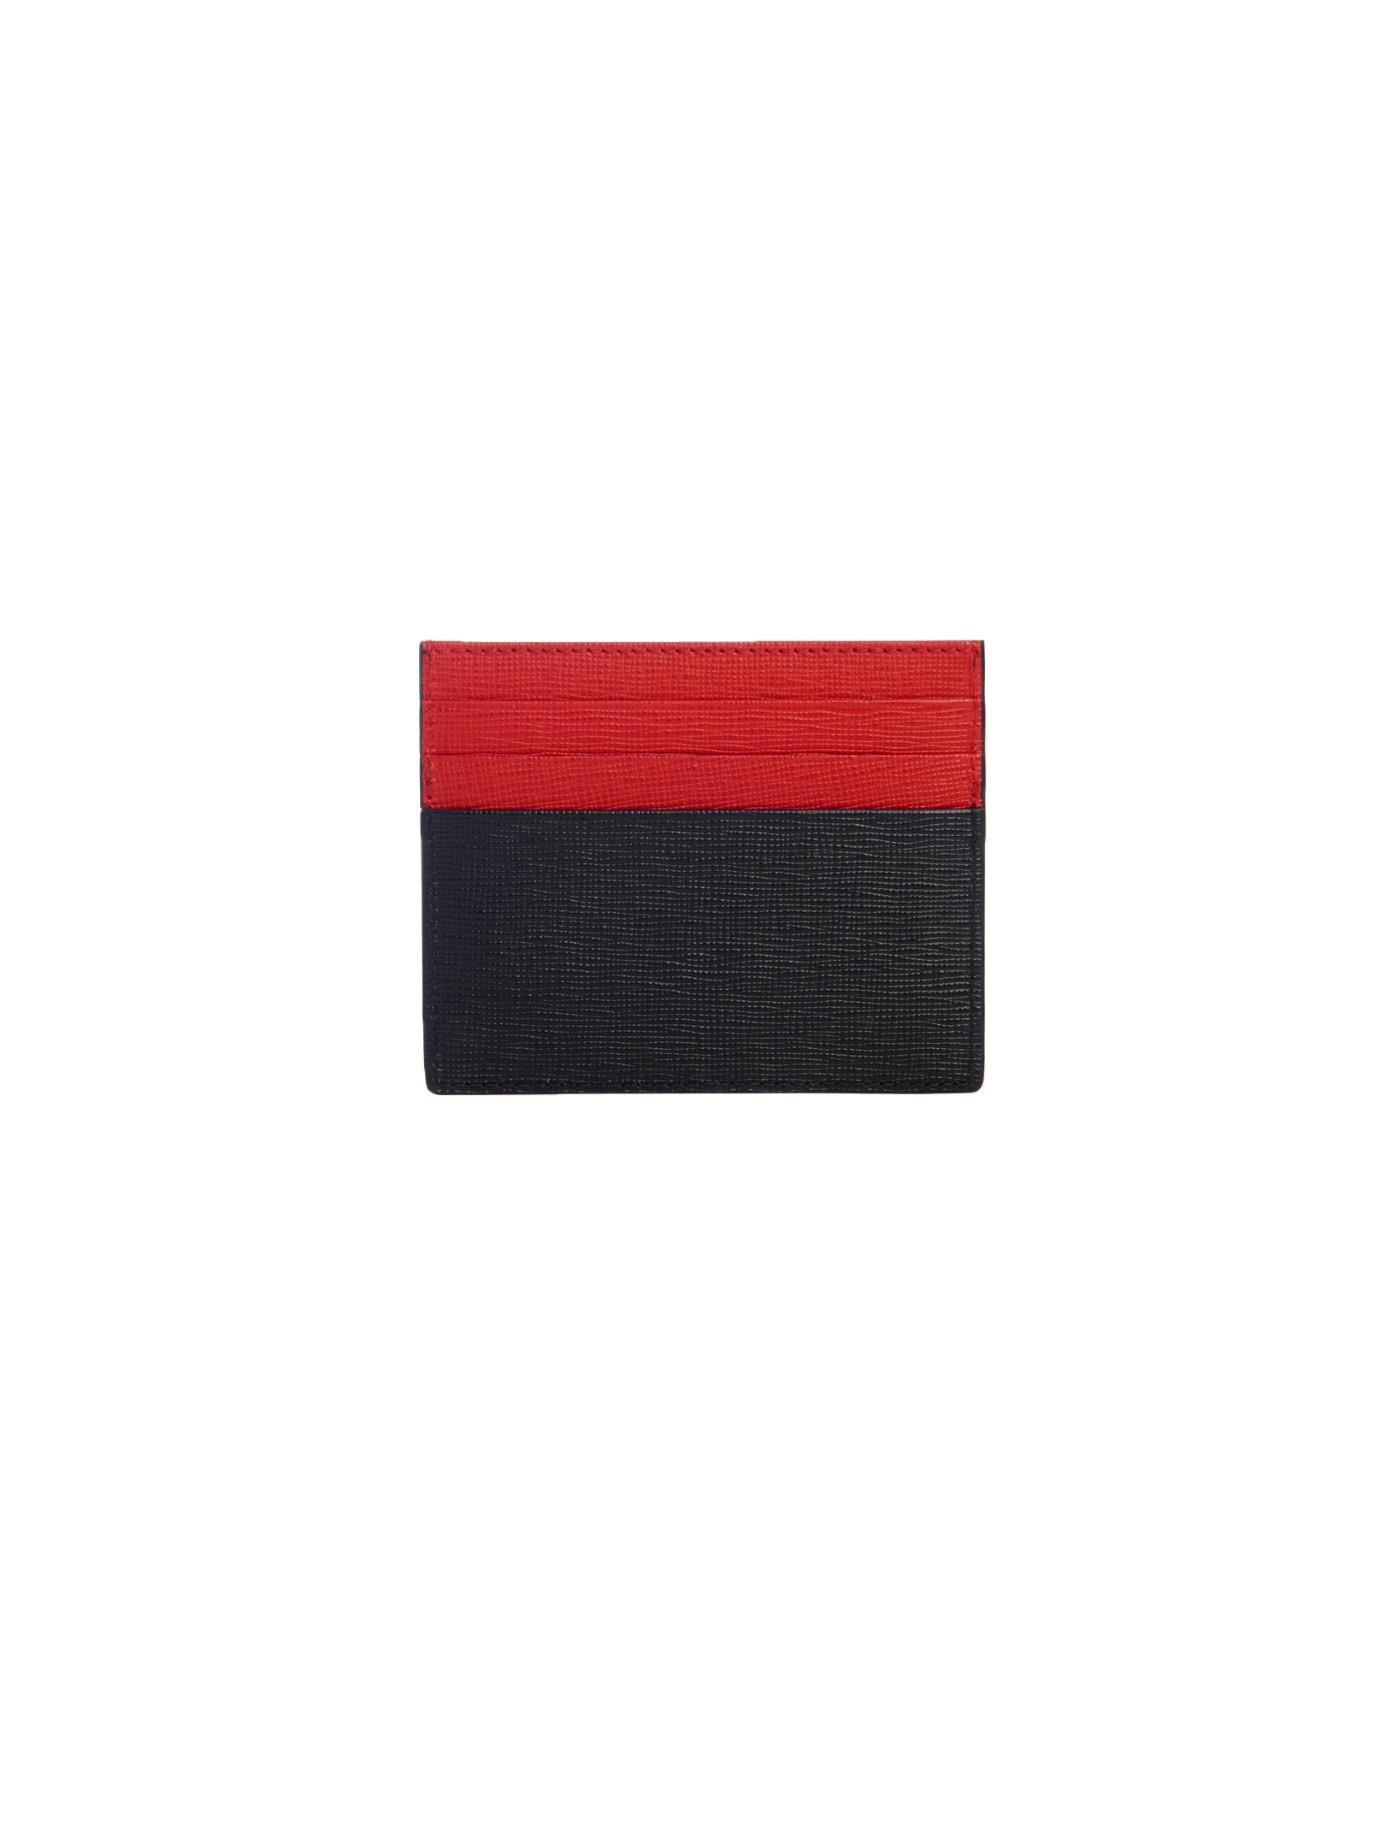 771569205d Fendi Bag Bugs Leather Cardholder in Black for Men - Lyst